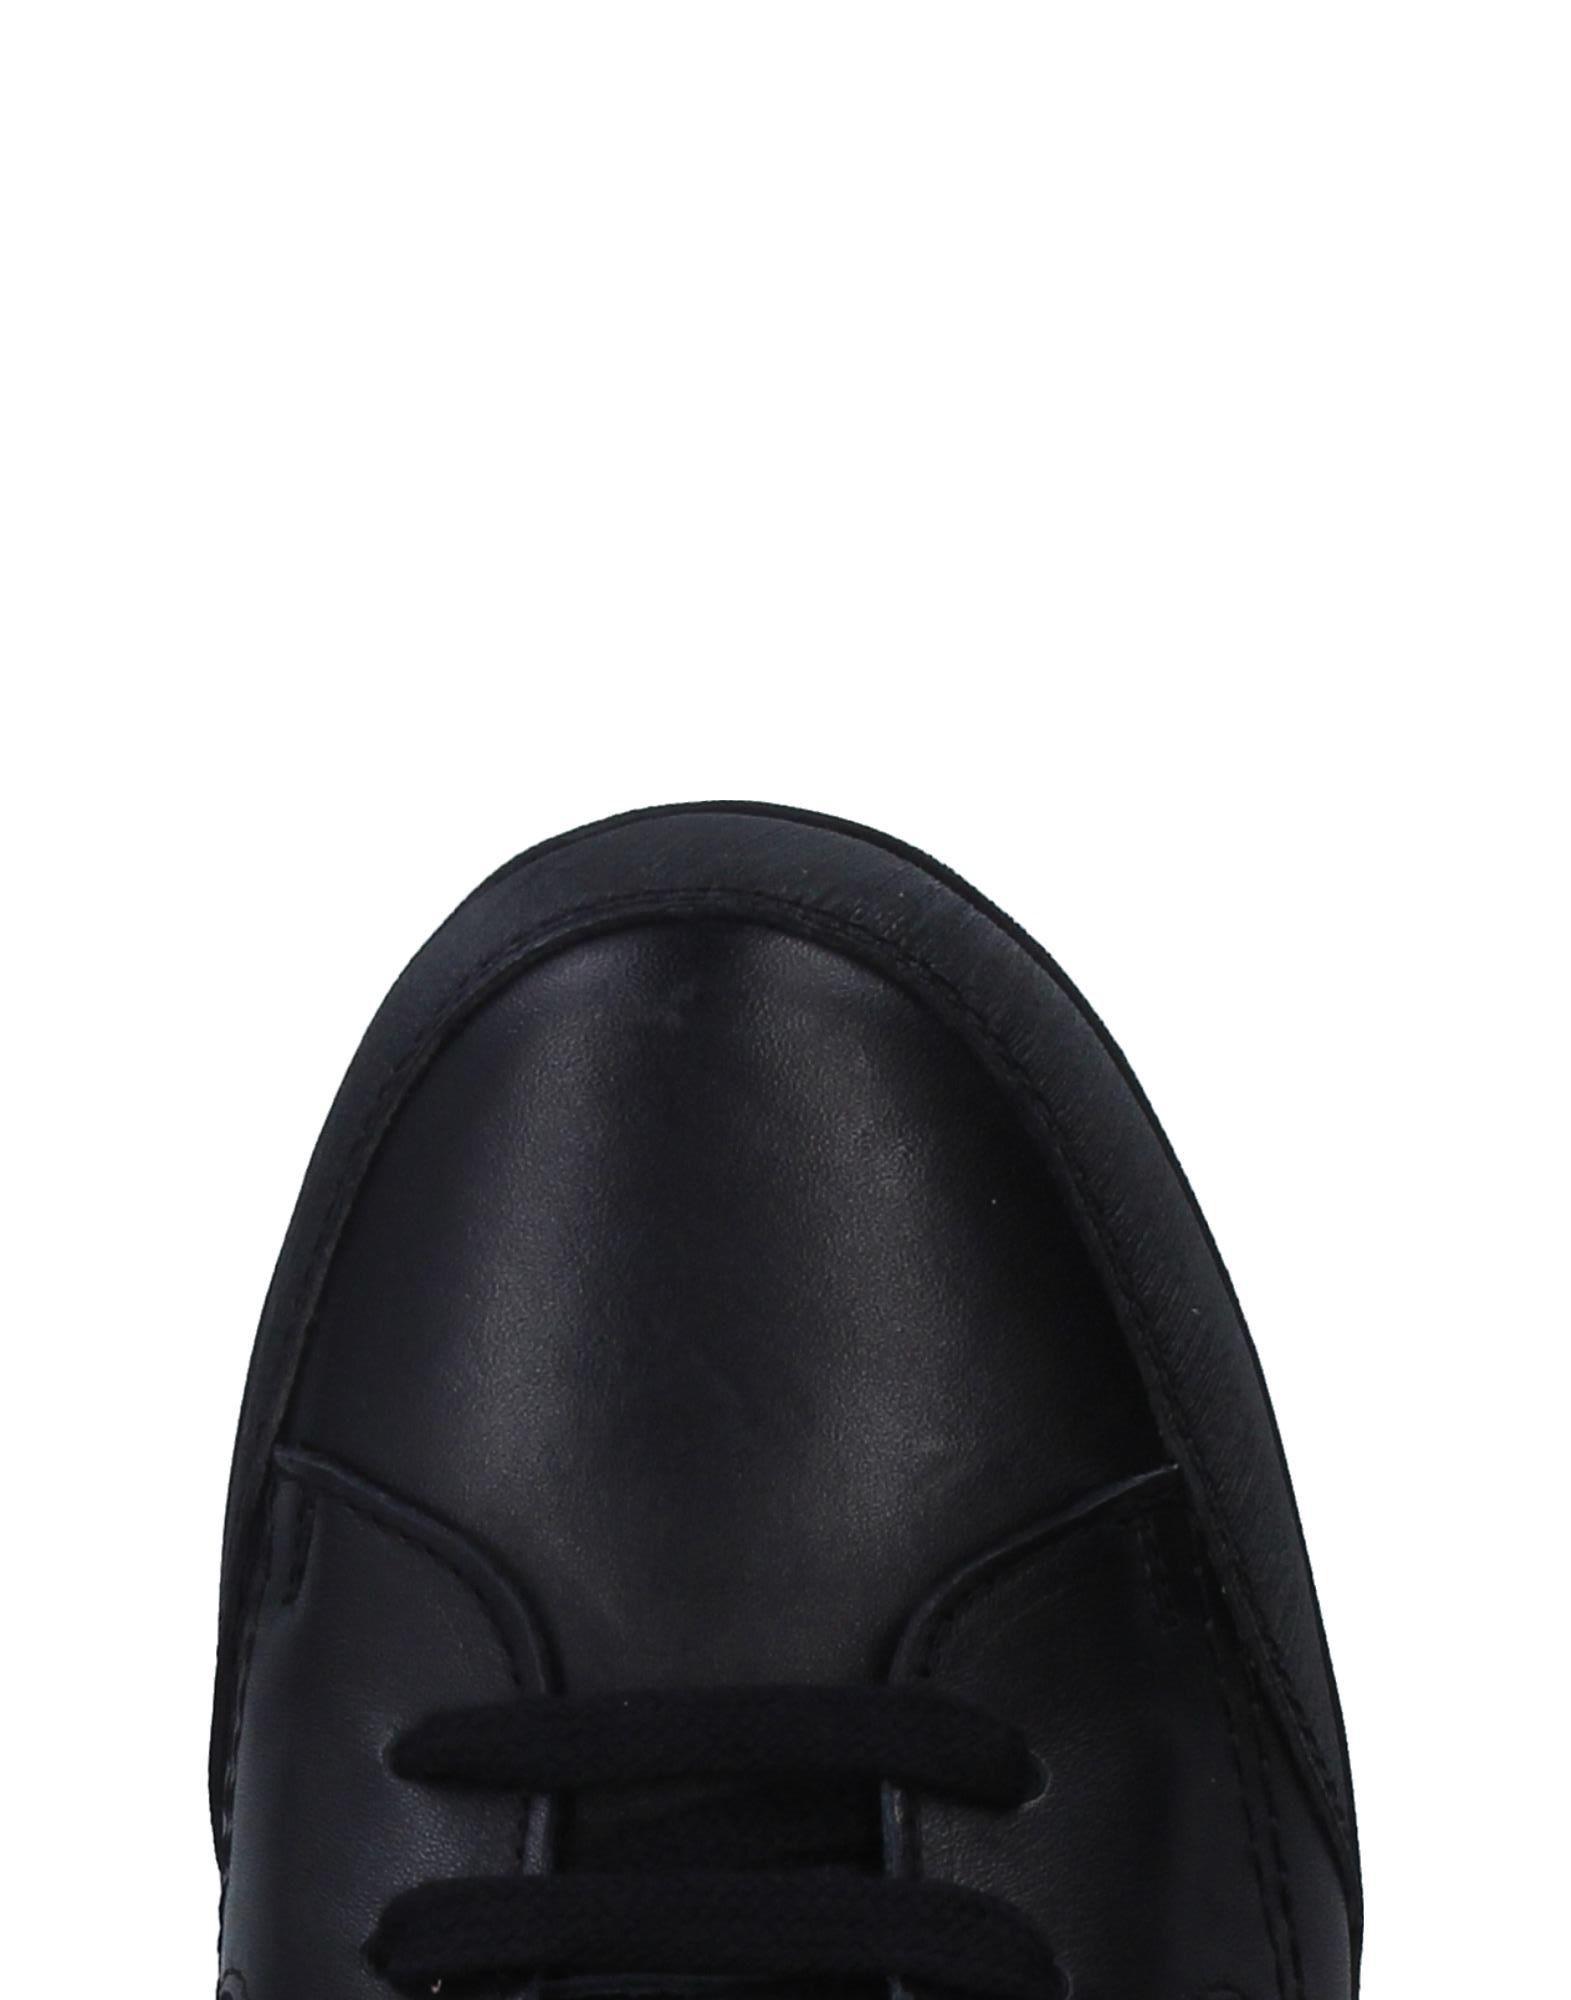 A buon mercato Sneakers Lumberjack Uomo - 11320983UE